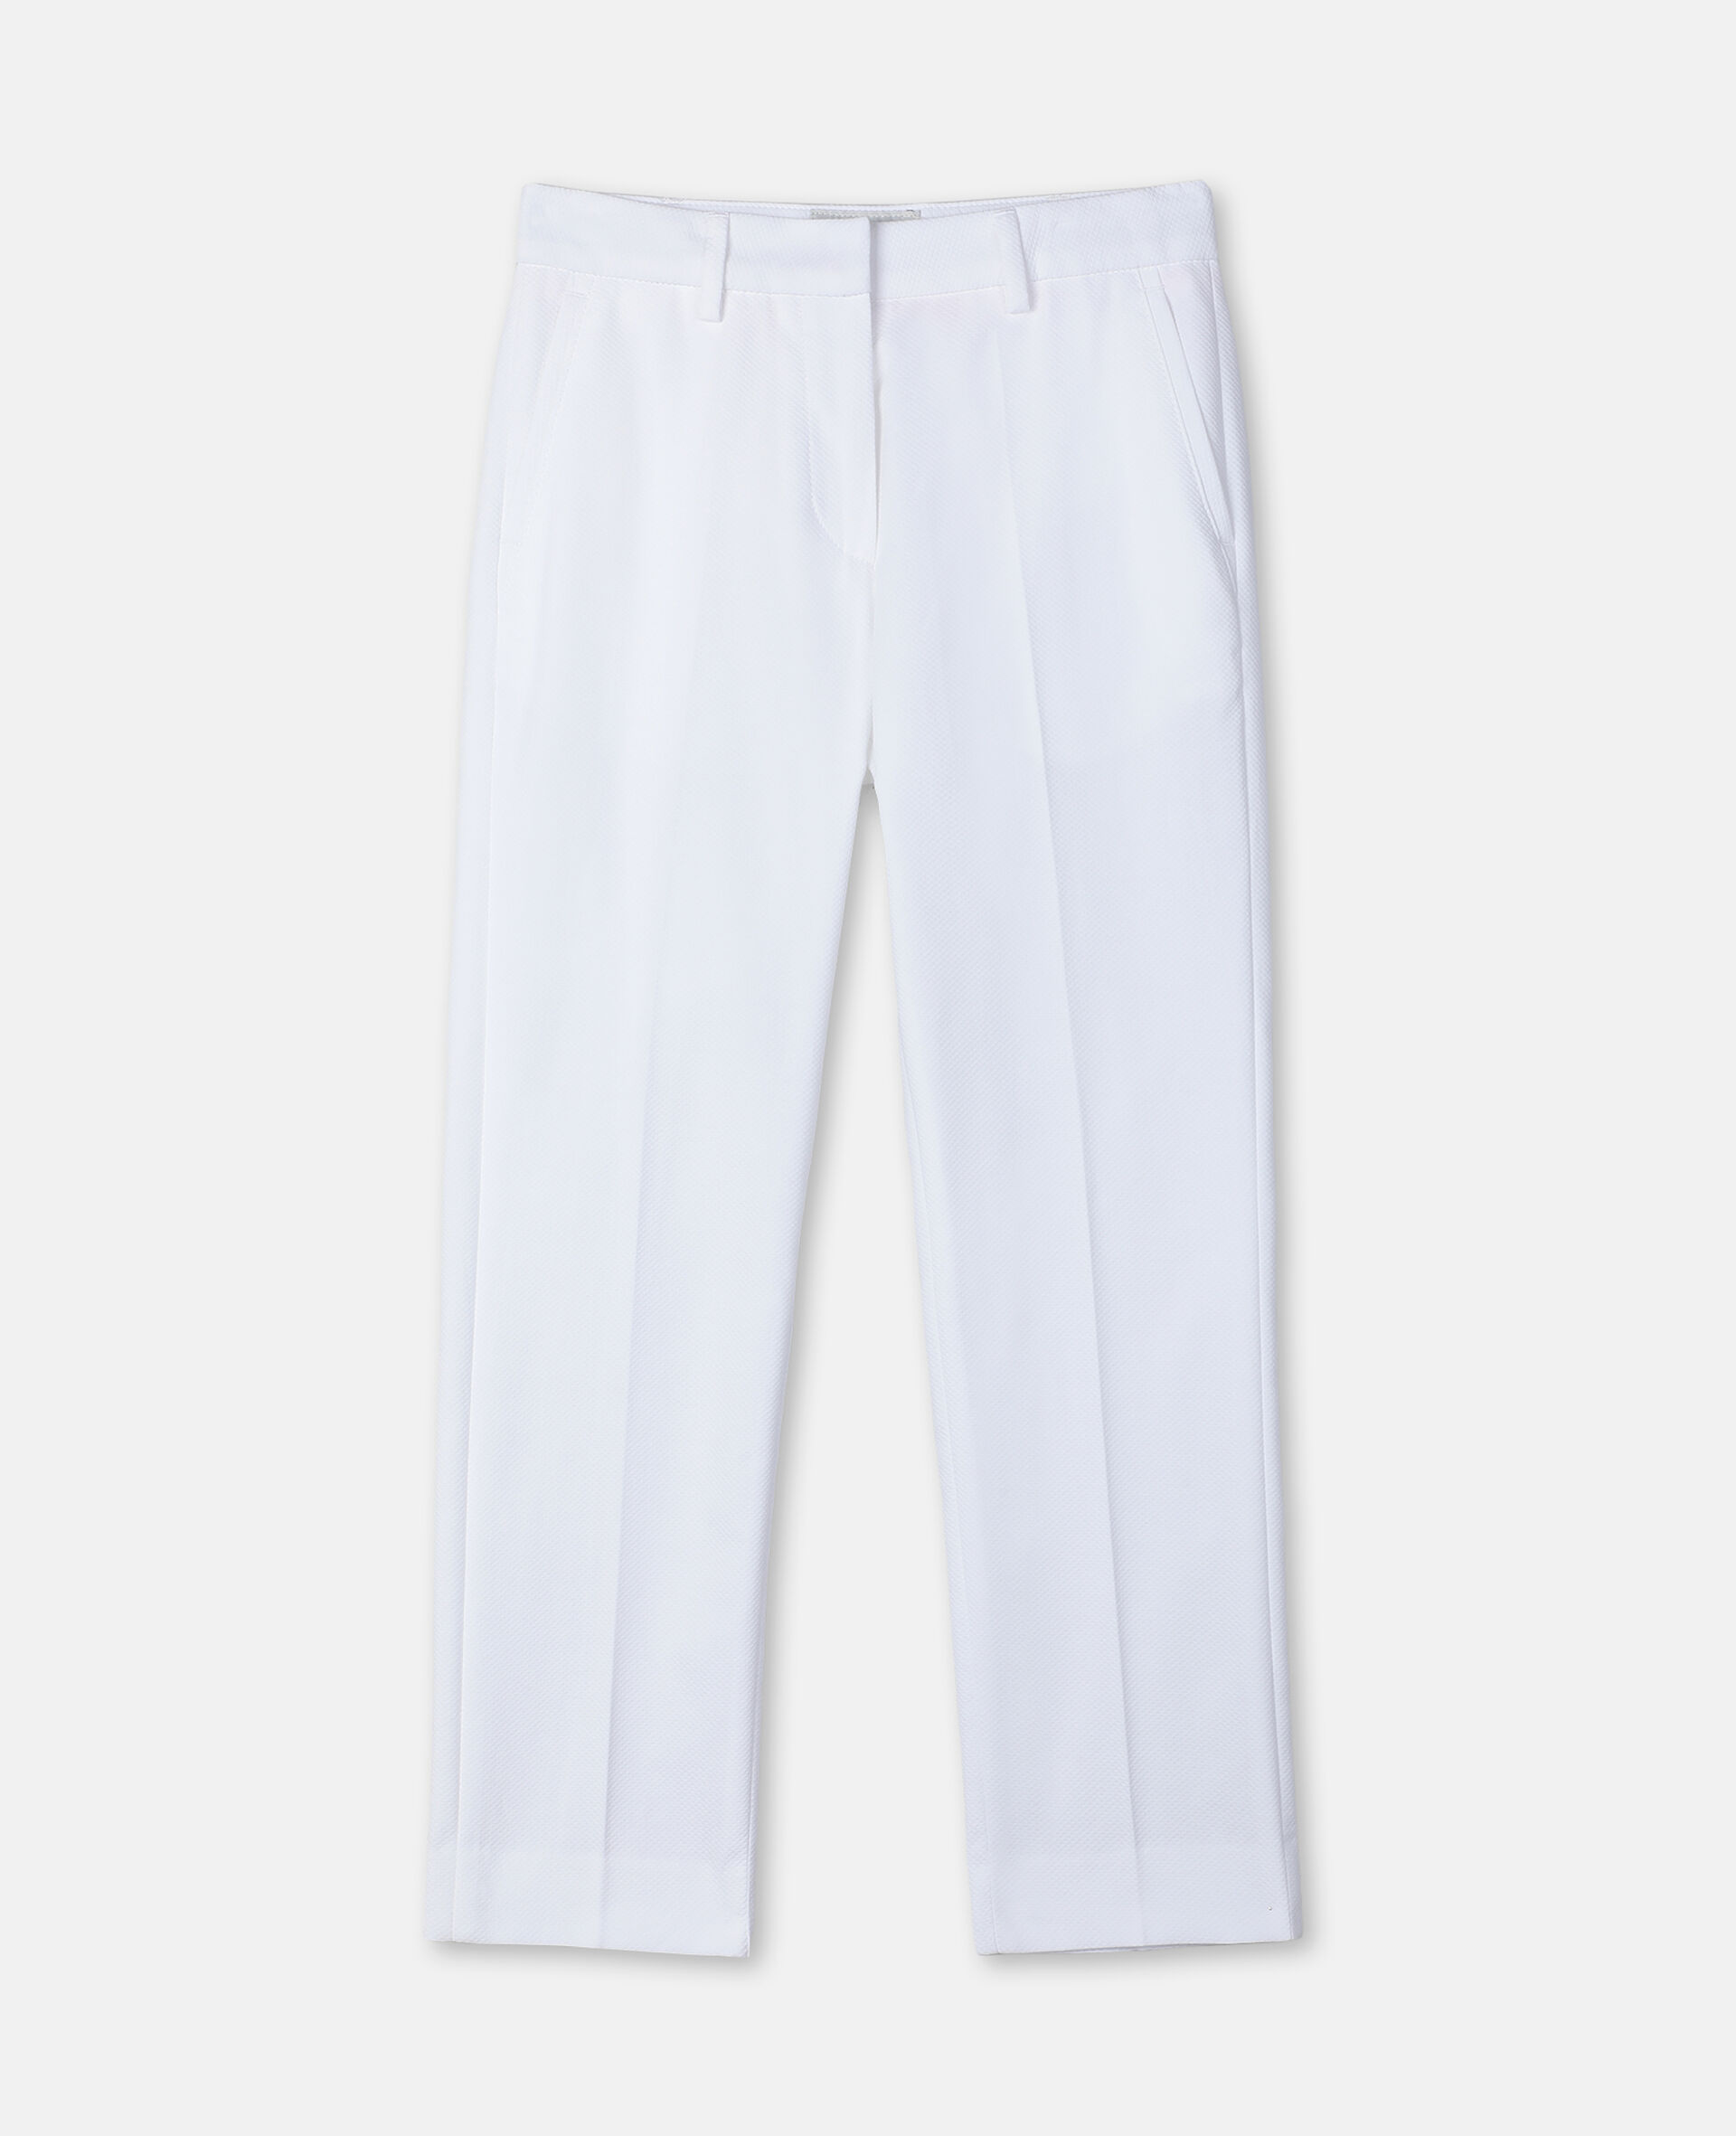 棉质珠地布西装裤-白色-large image number 0